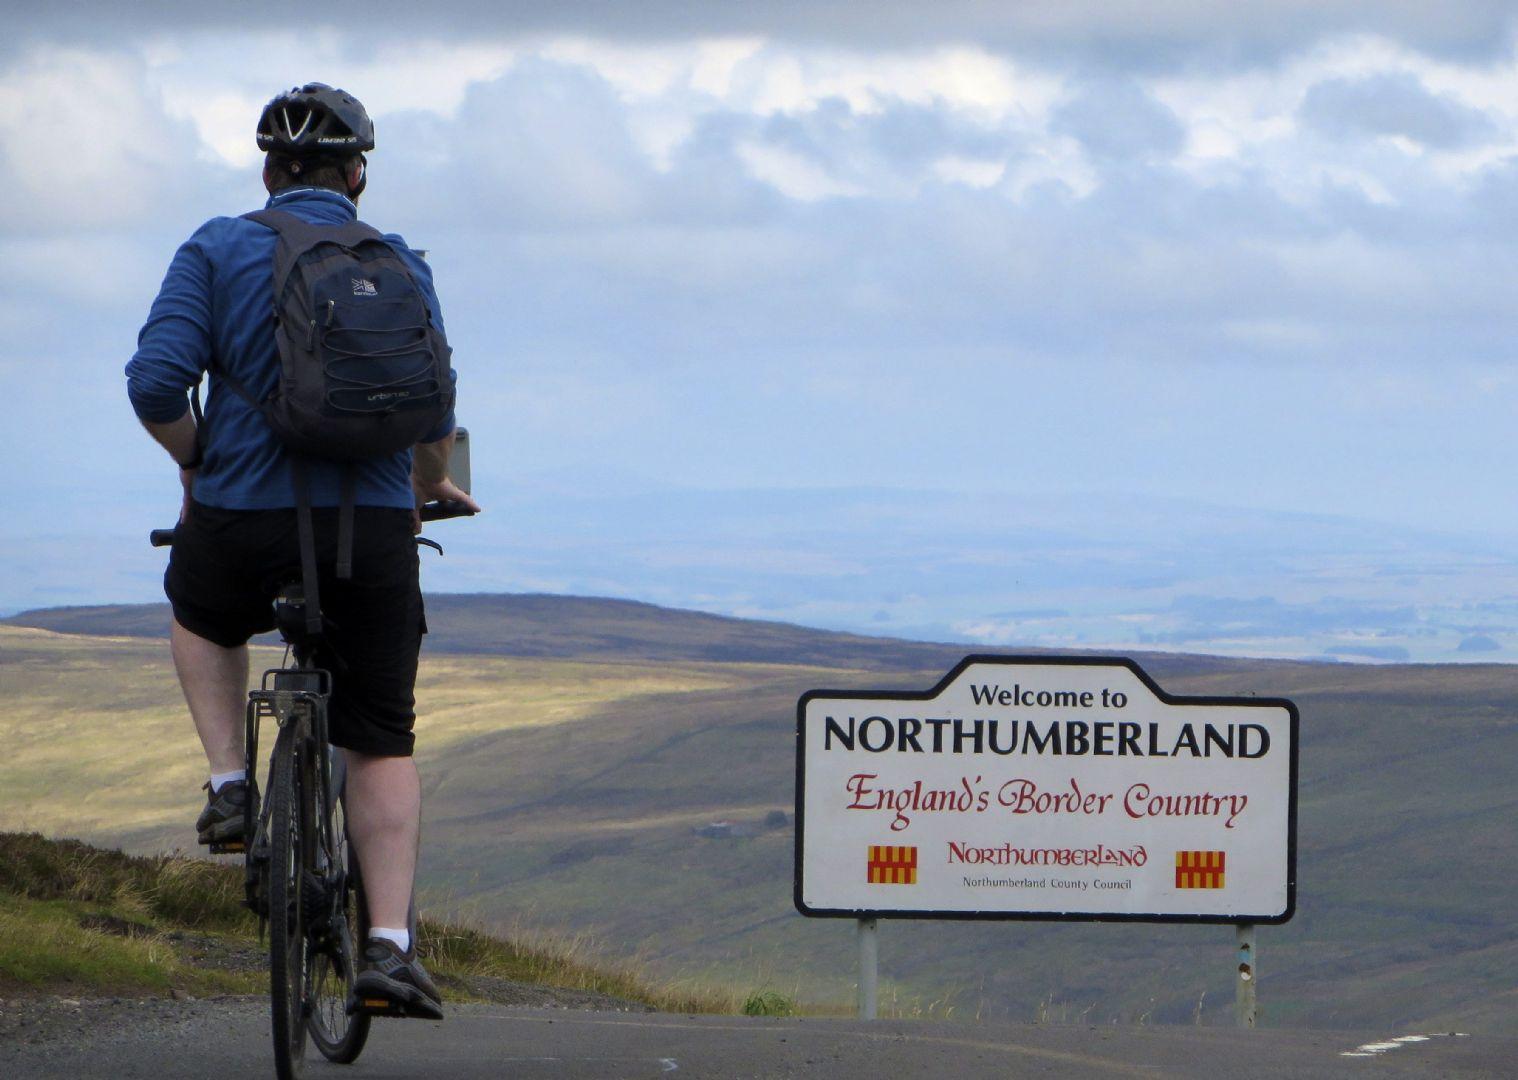 _Customer.47248.18361.jpg - UK - C2C - Coast to Coast 4 Days Cycling - Self-Guided Leisure Cycling Holiday - Leisure Cycling